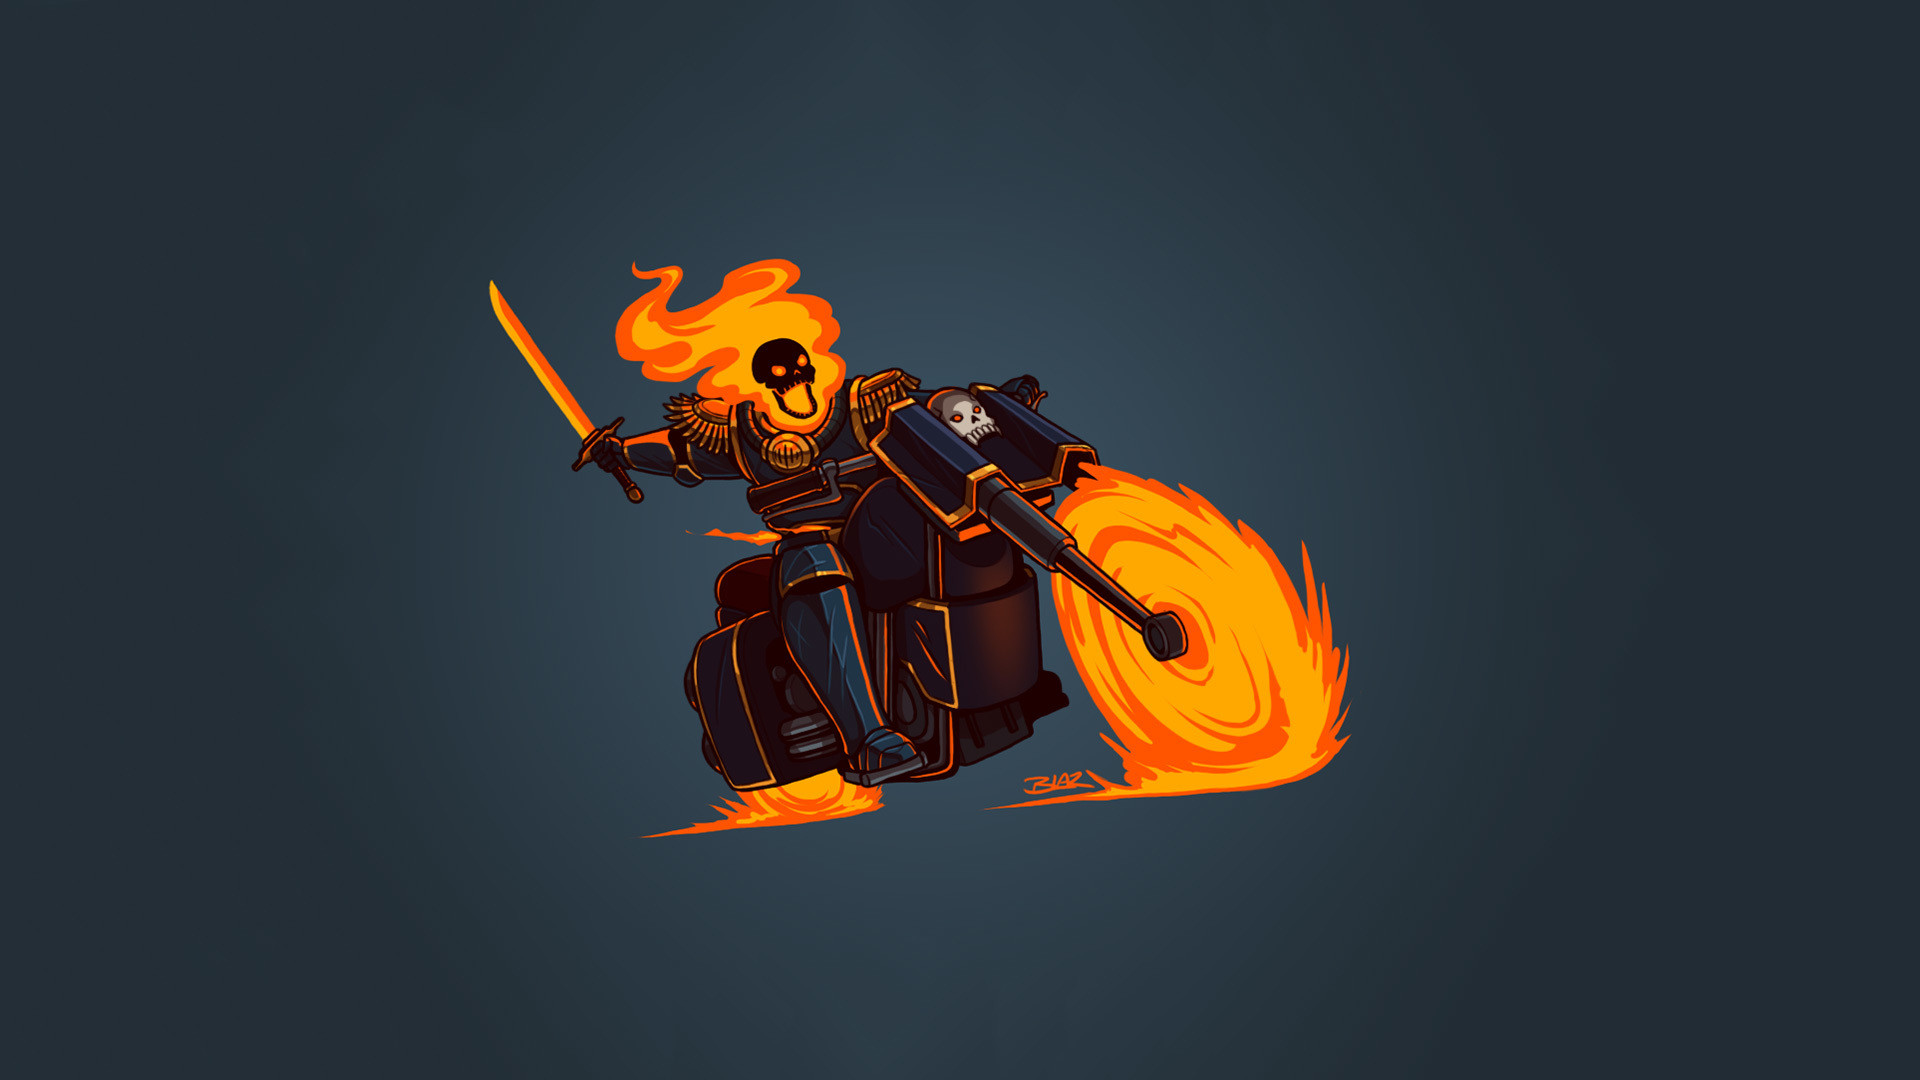 Top 10 Wallpapers Hd 1080p Desktop Wallpaper Ghost Rider Marvel Comics Minimalism